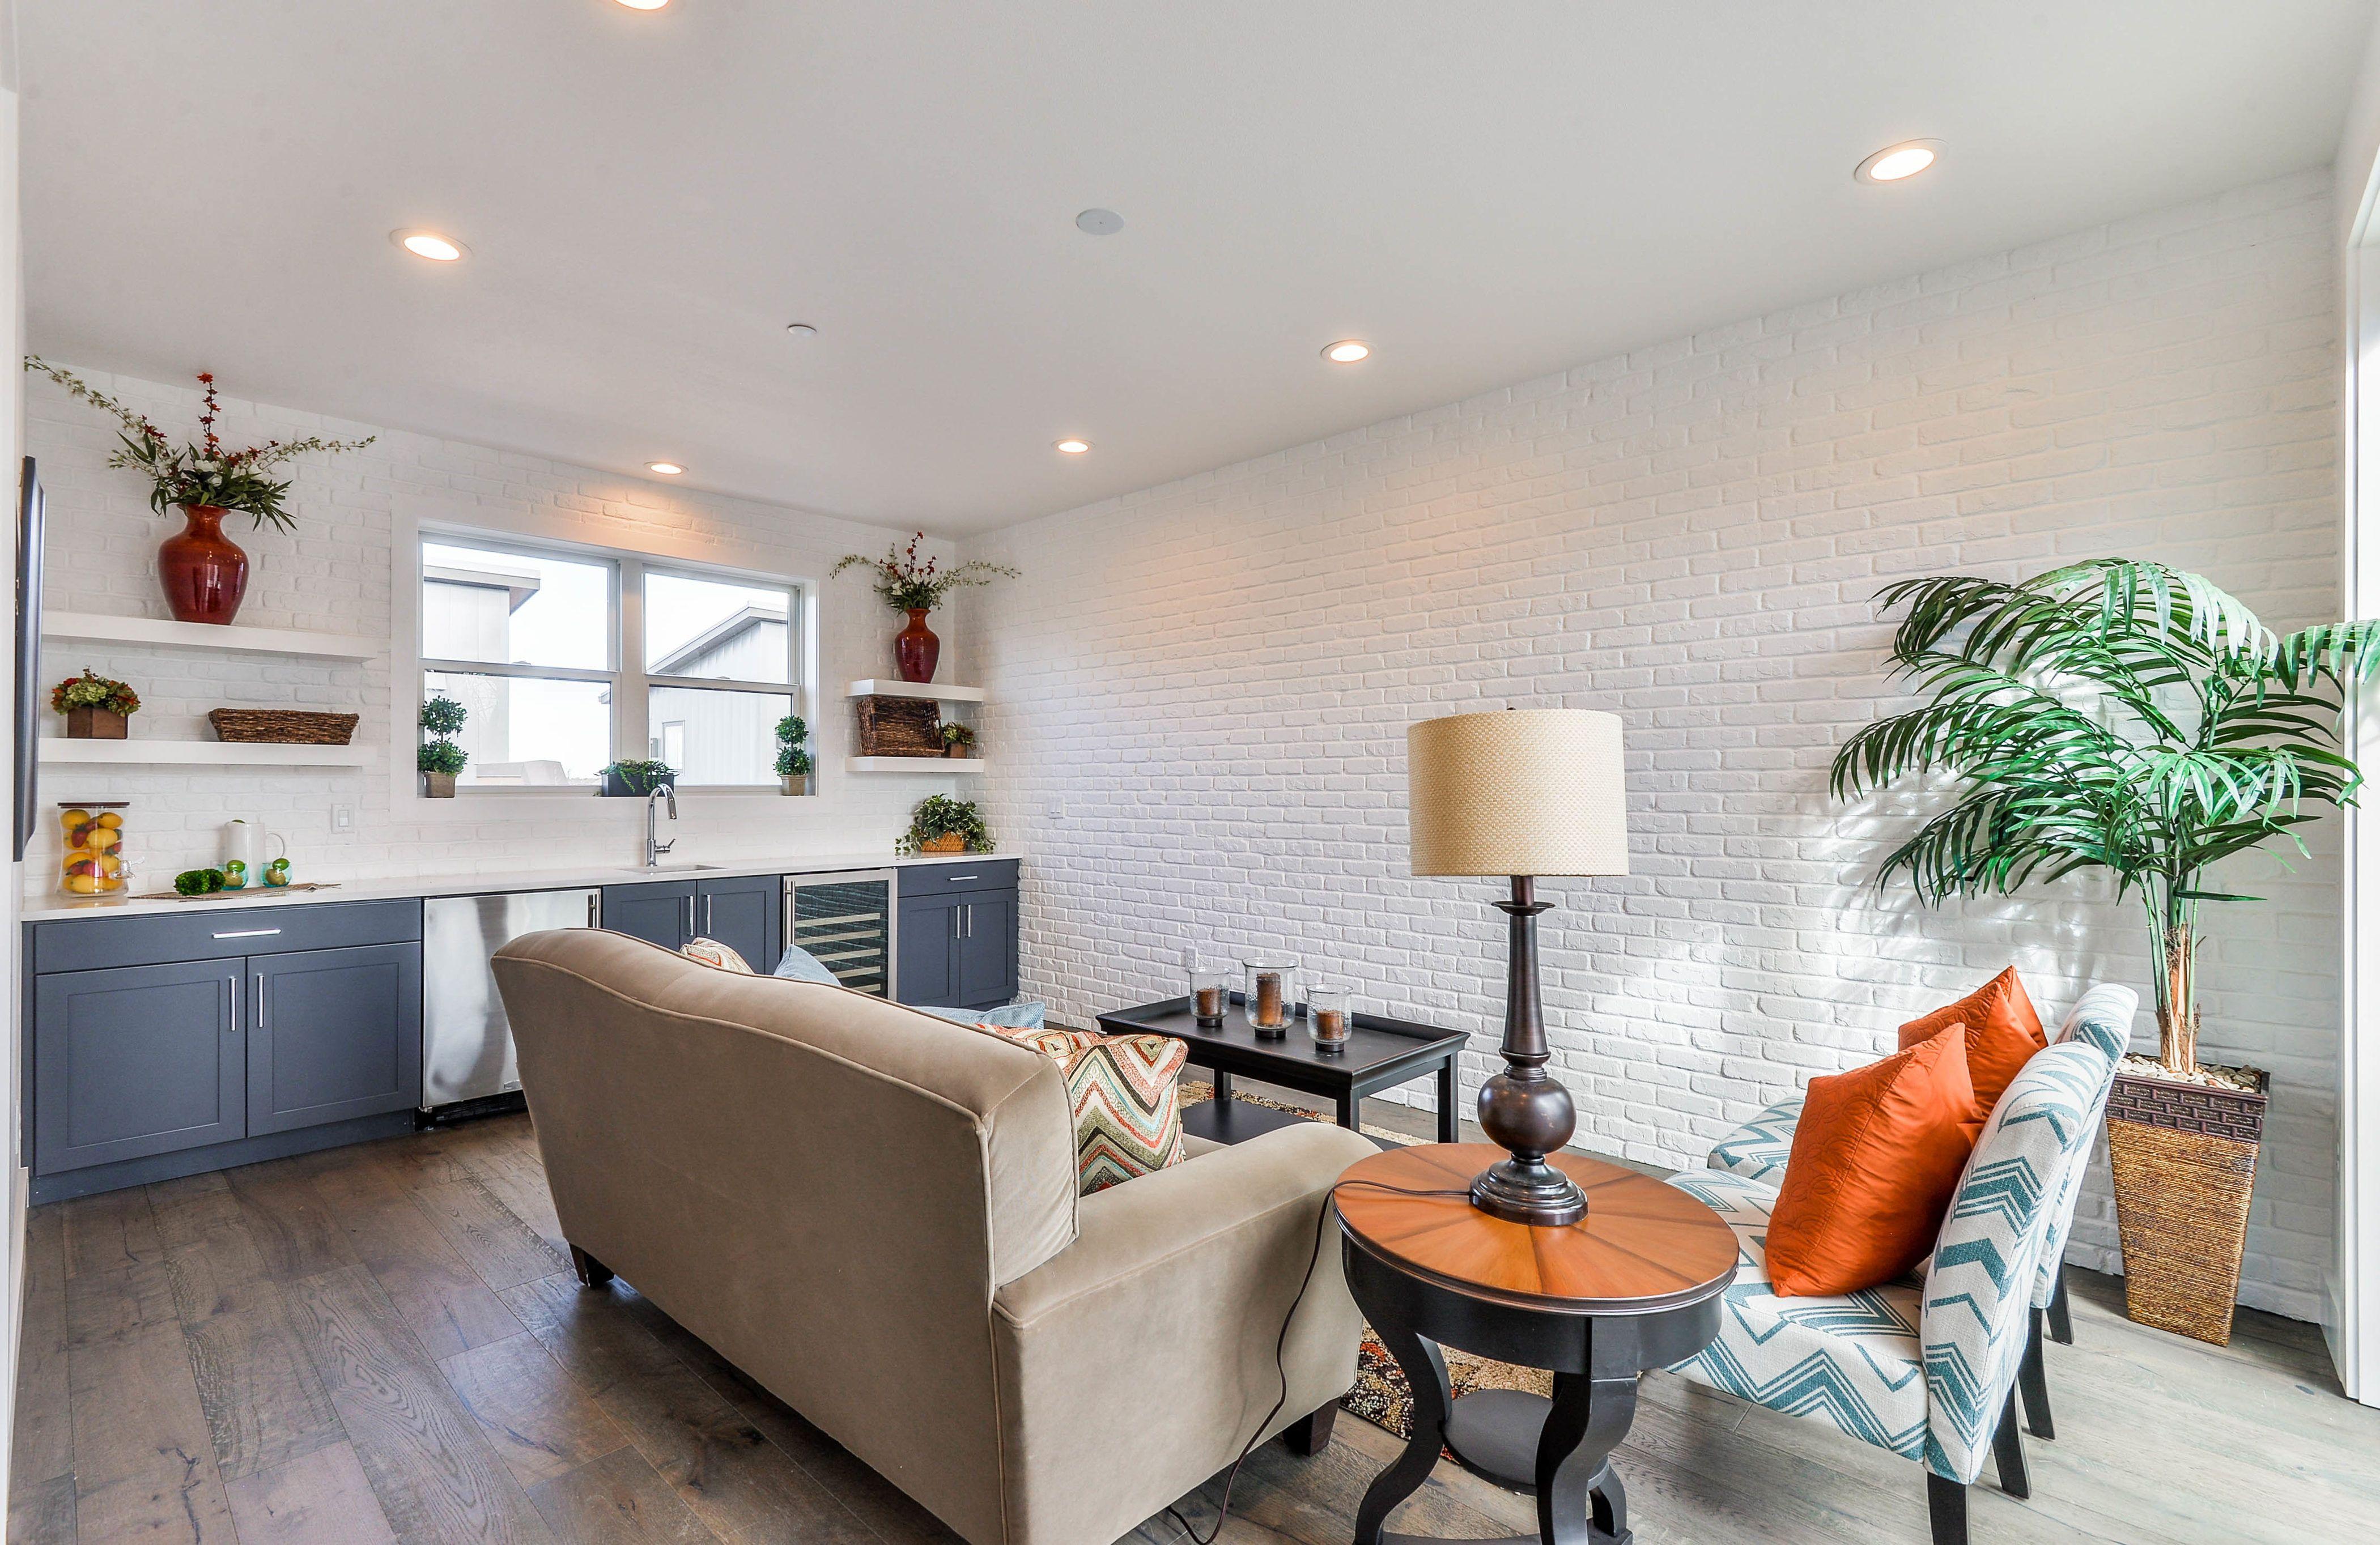 Bright living room fort collins co living room fort